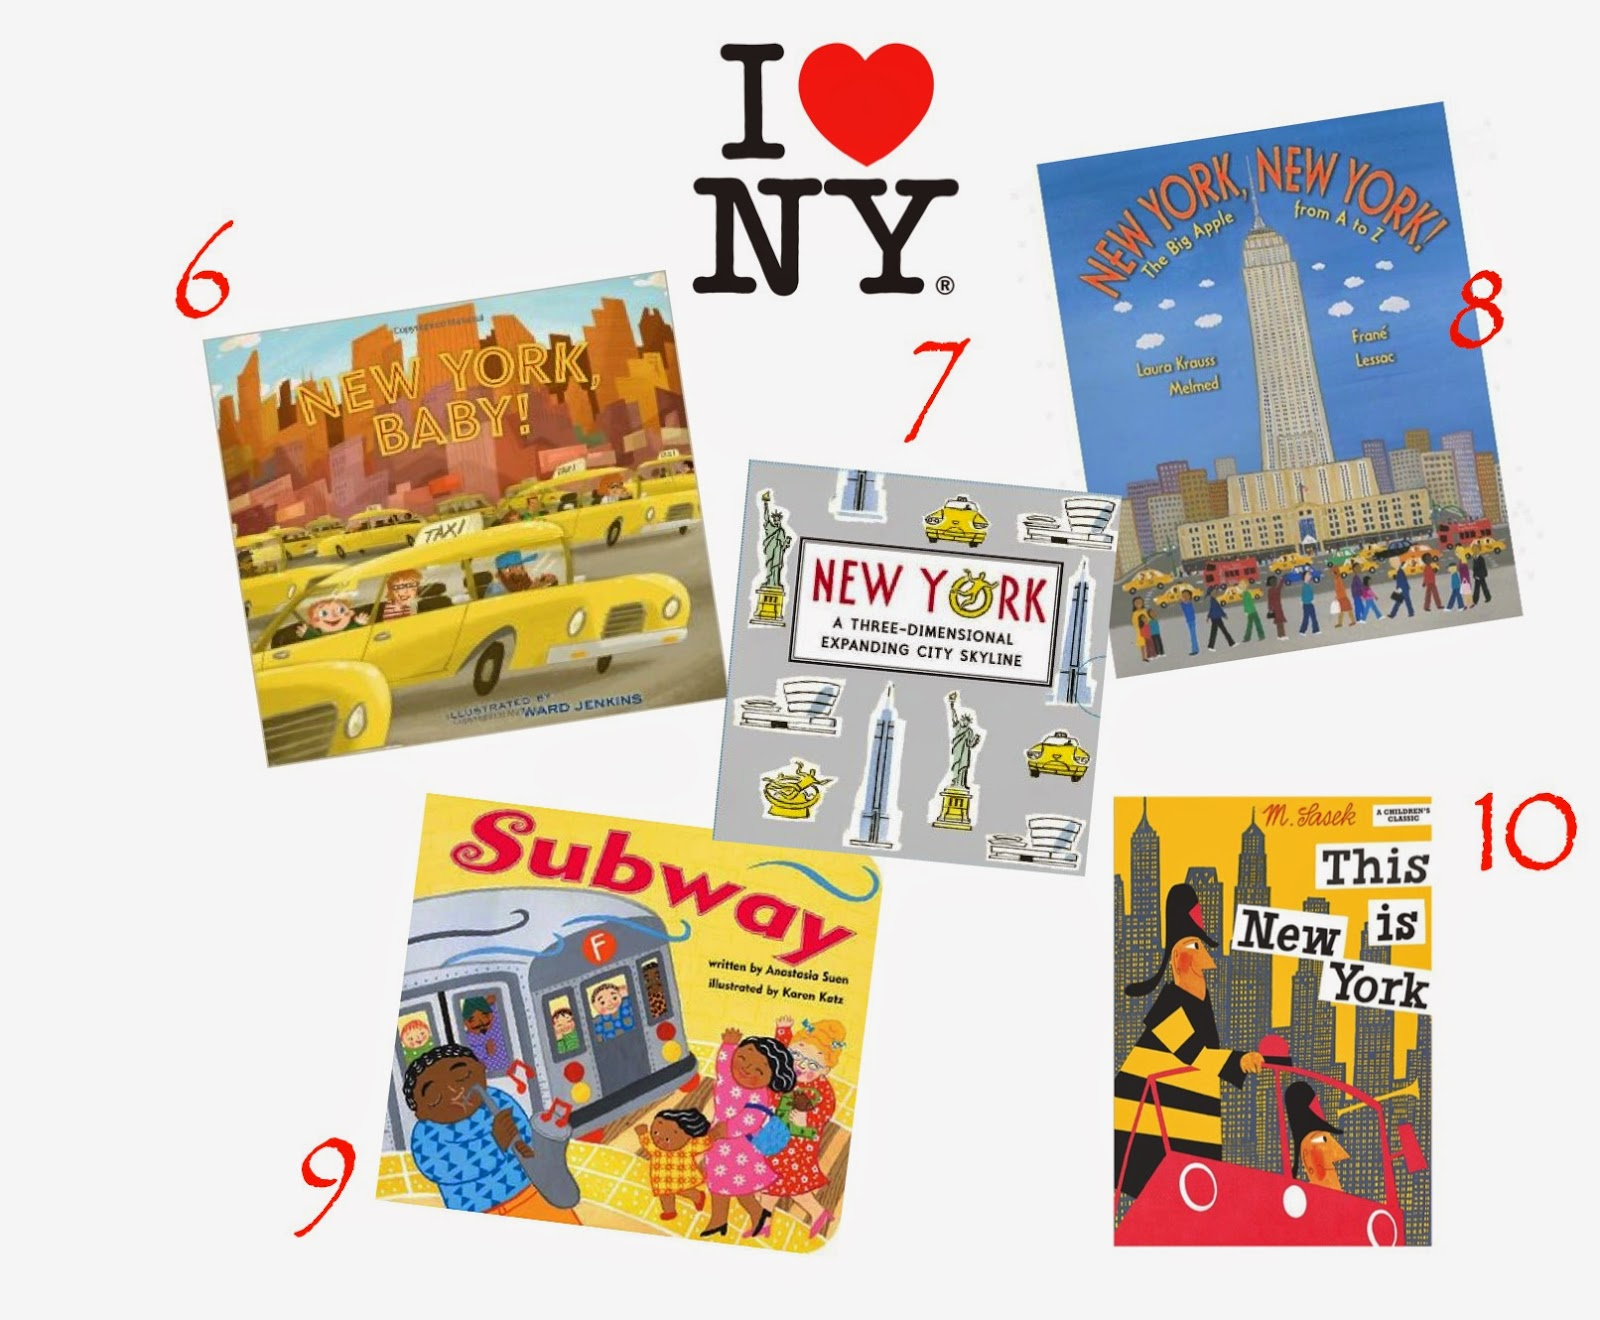 Build a classic library *New York Fashion Week* Special | amazon.co.uk | amazon.com | new york fashion week | mamasvib | fashion week | children's books | class books for kids | book club | sunday night book club | books | reading with kids | the big apple | yellow cab | new york | manhattan | nursery books | mamasvib | blogger | books | baby boos | board books | travel cites | new yorker